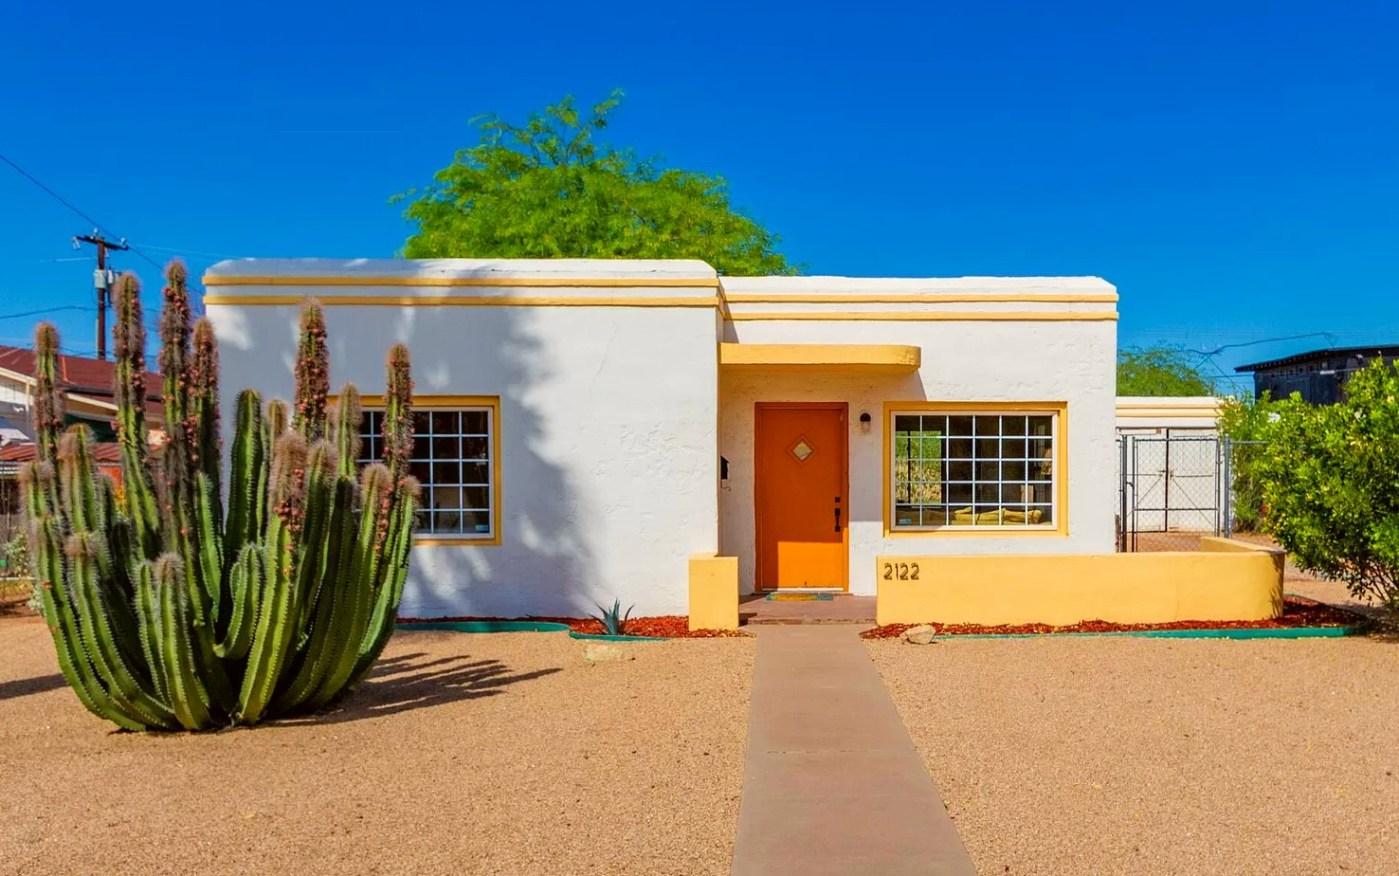 1940 Art Deco house in Arizona